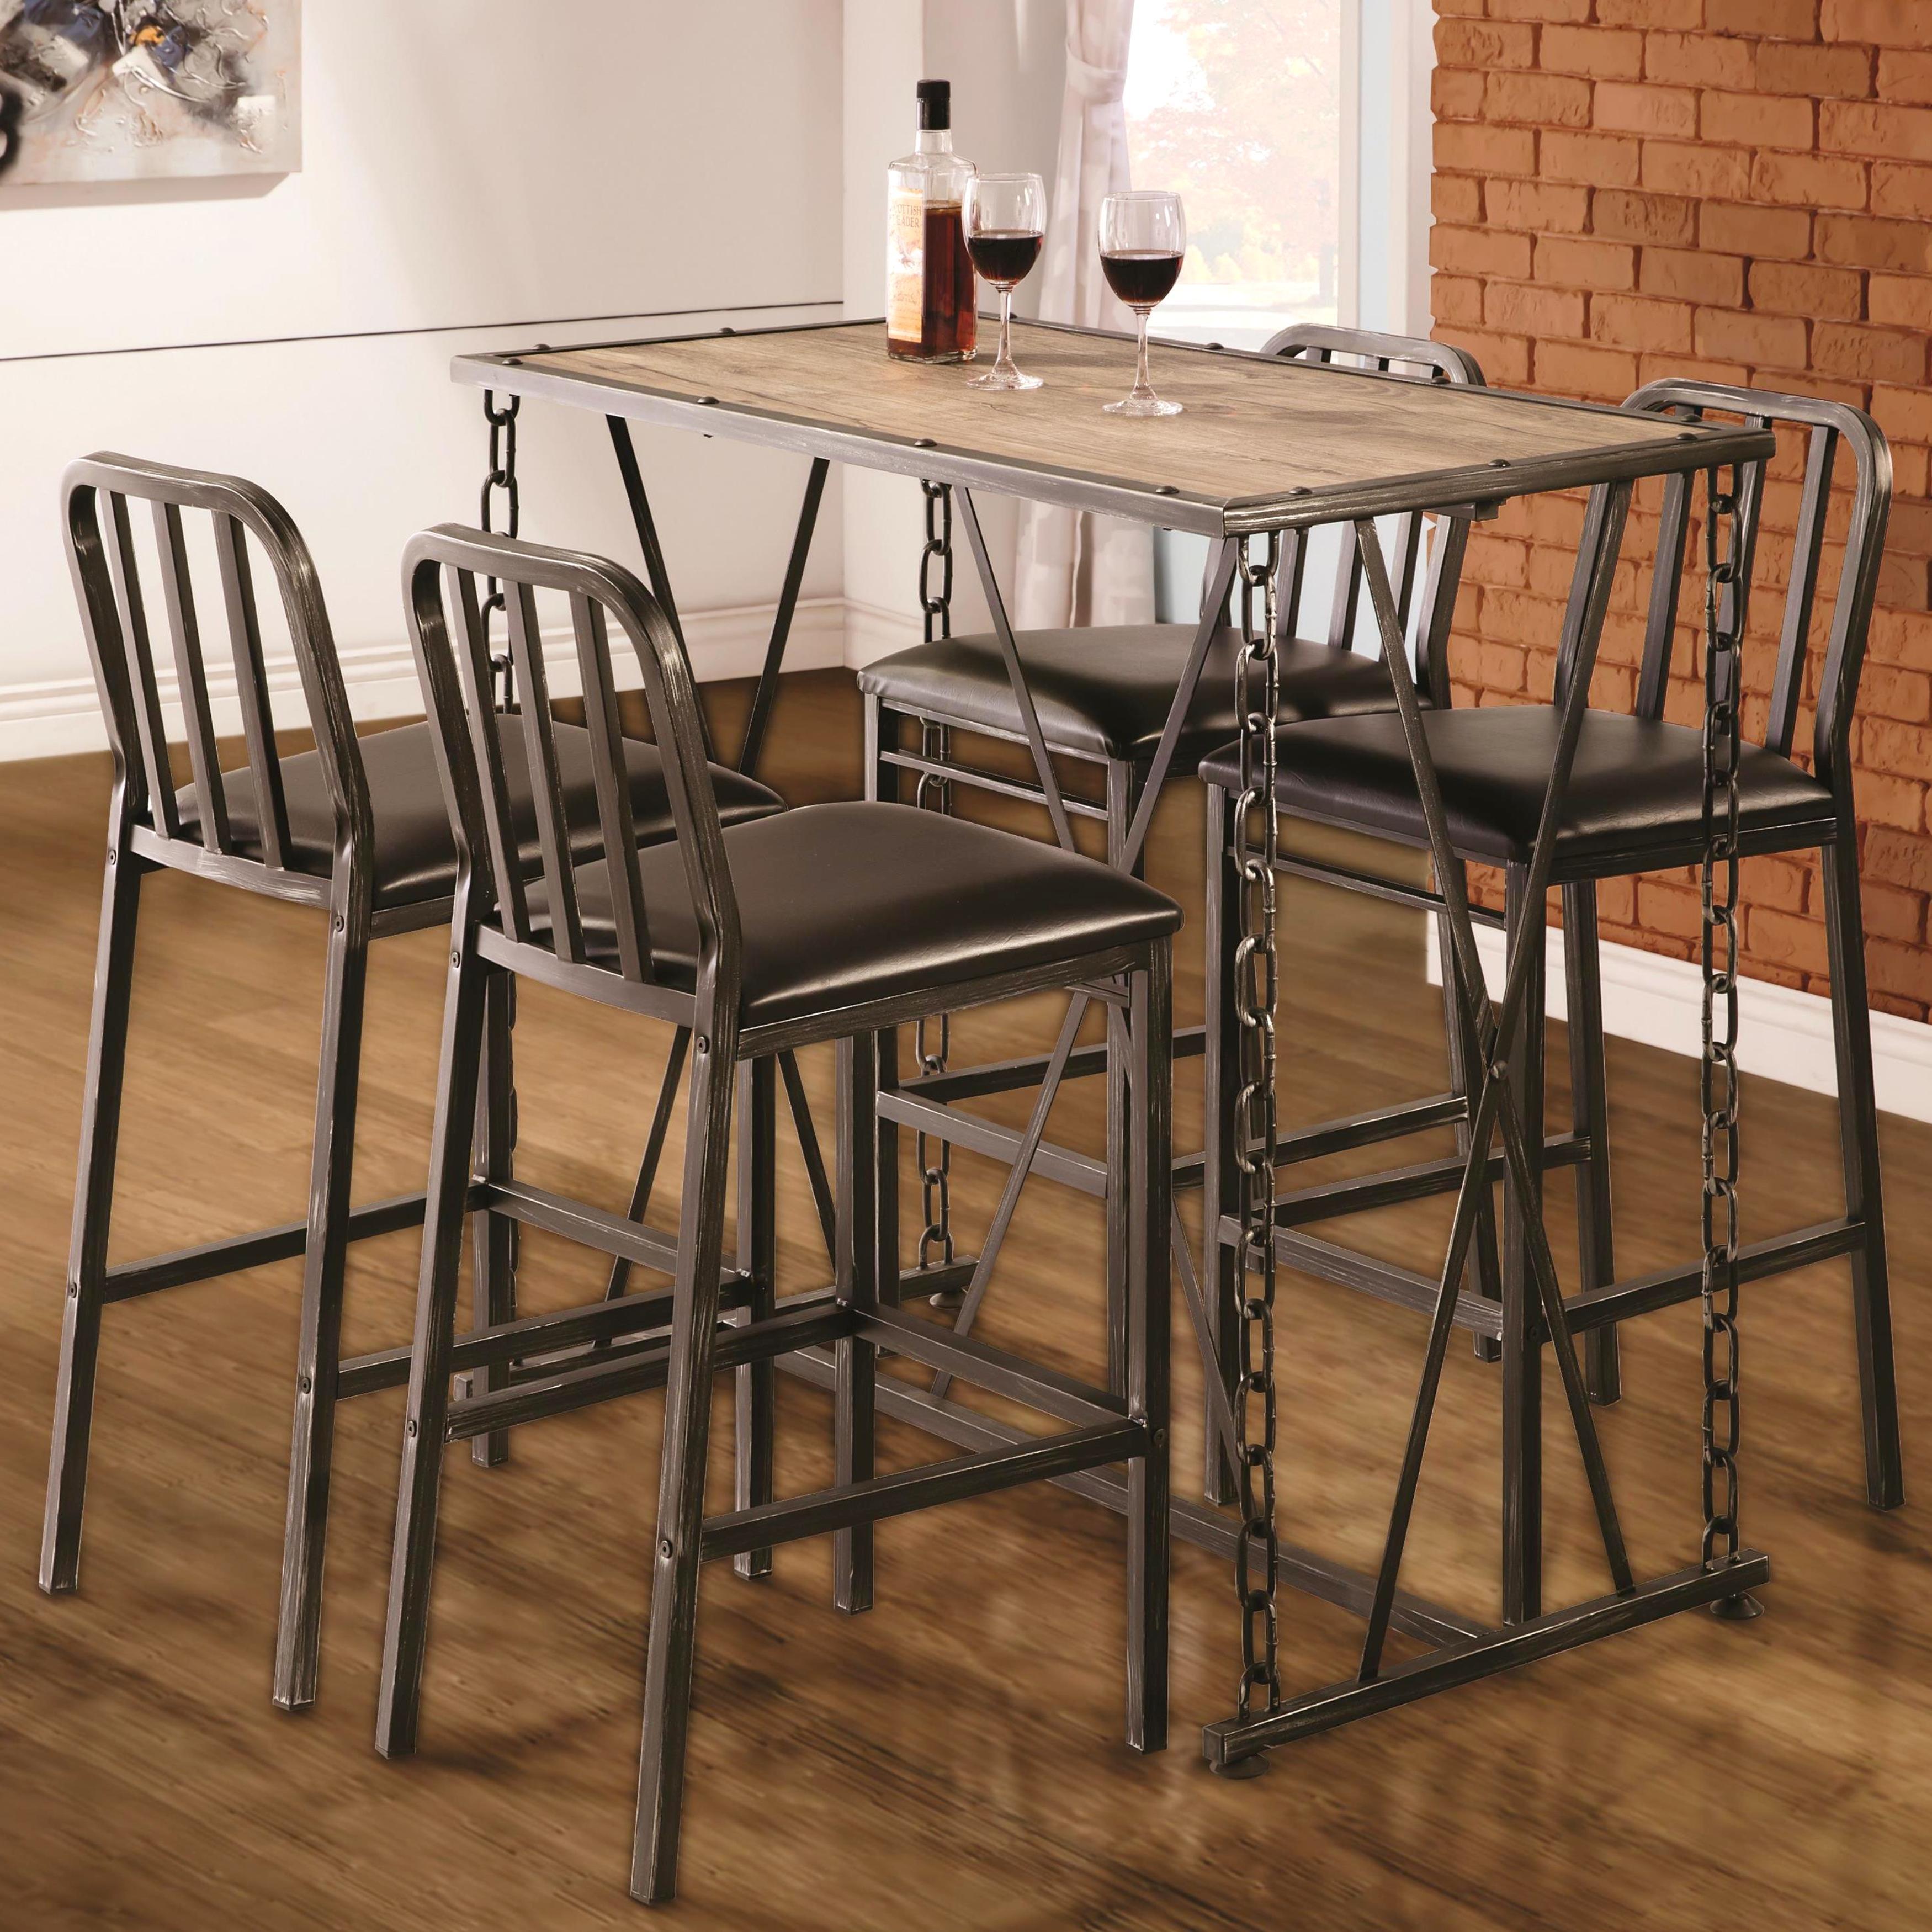 Chain Link Bistro Bar Pub Table